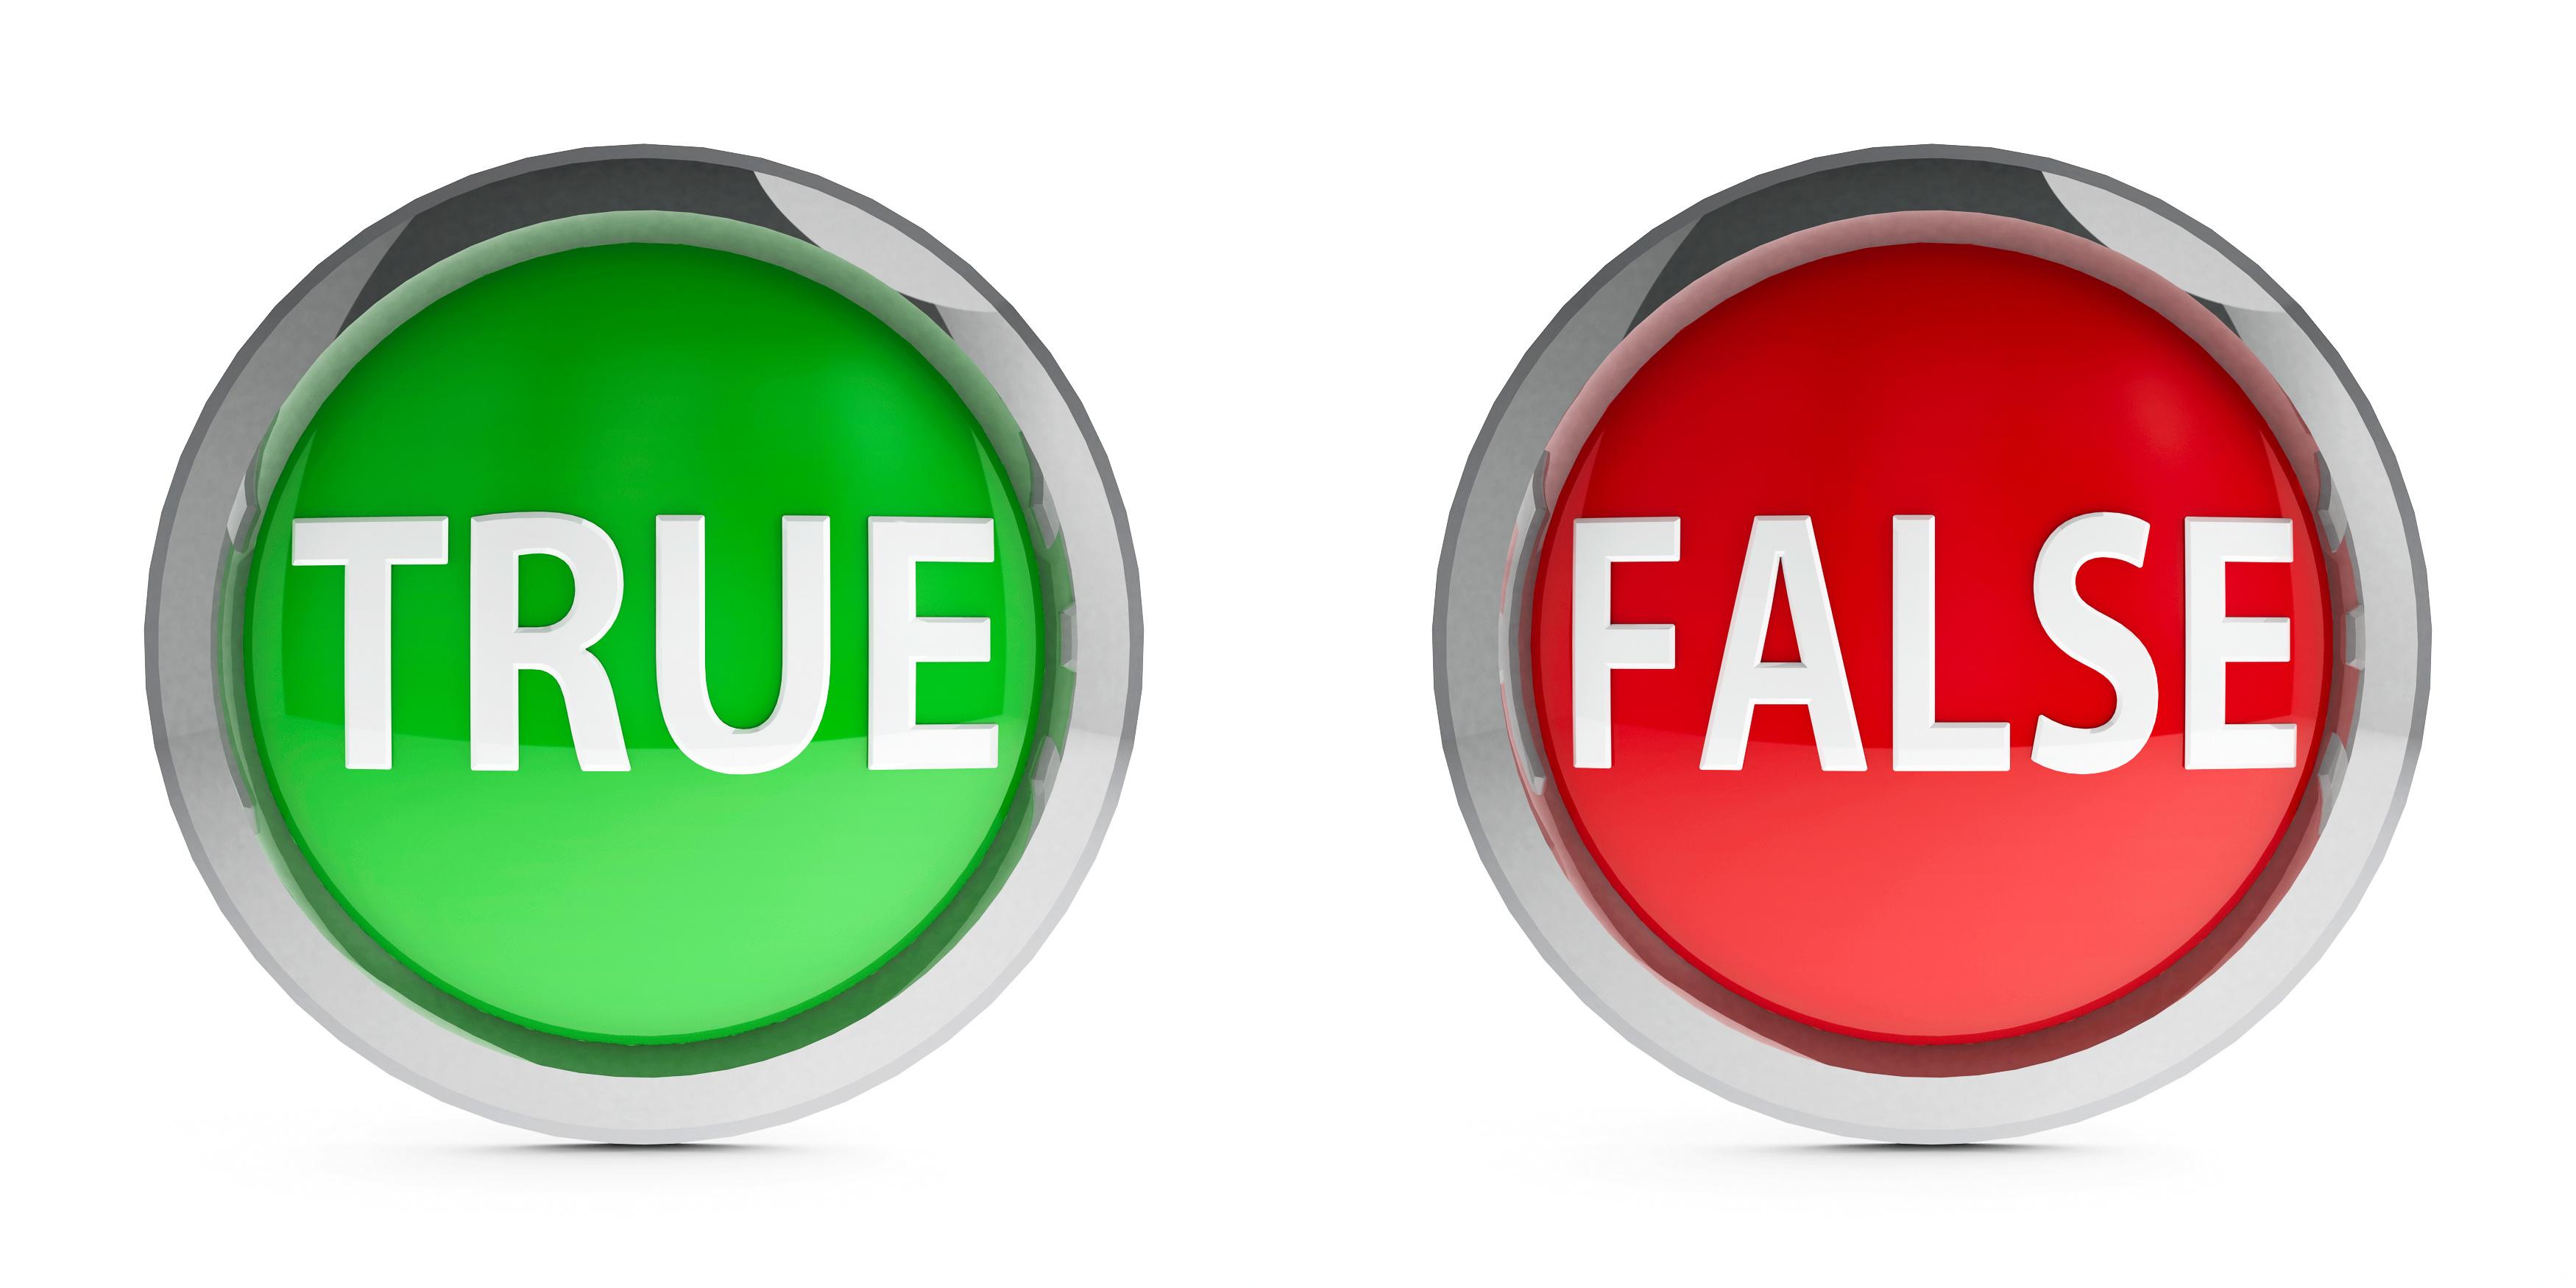 true and false png transparent true and false png images pluspng